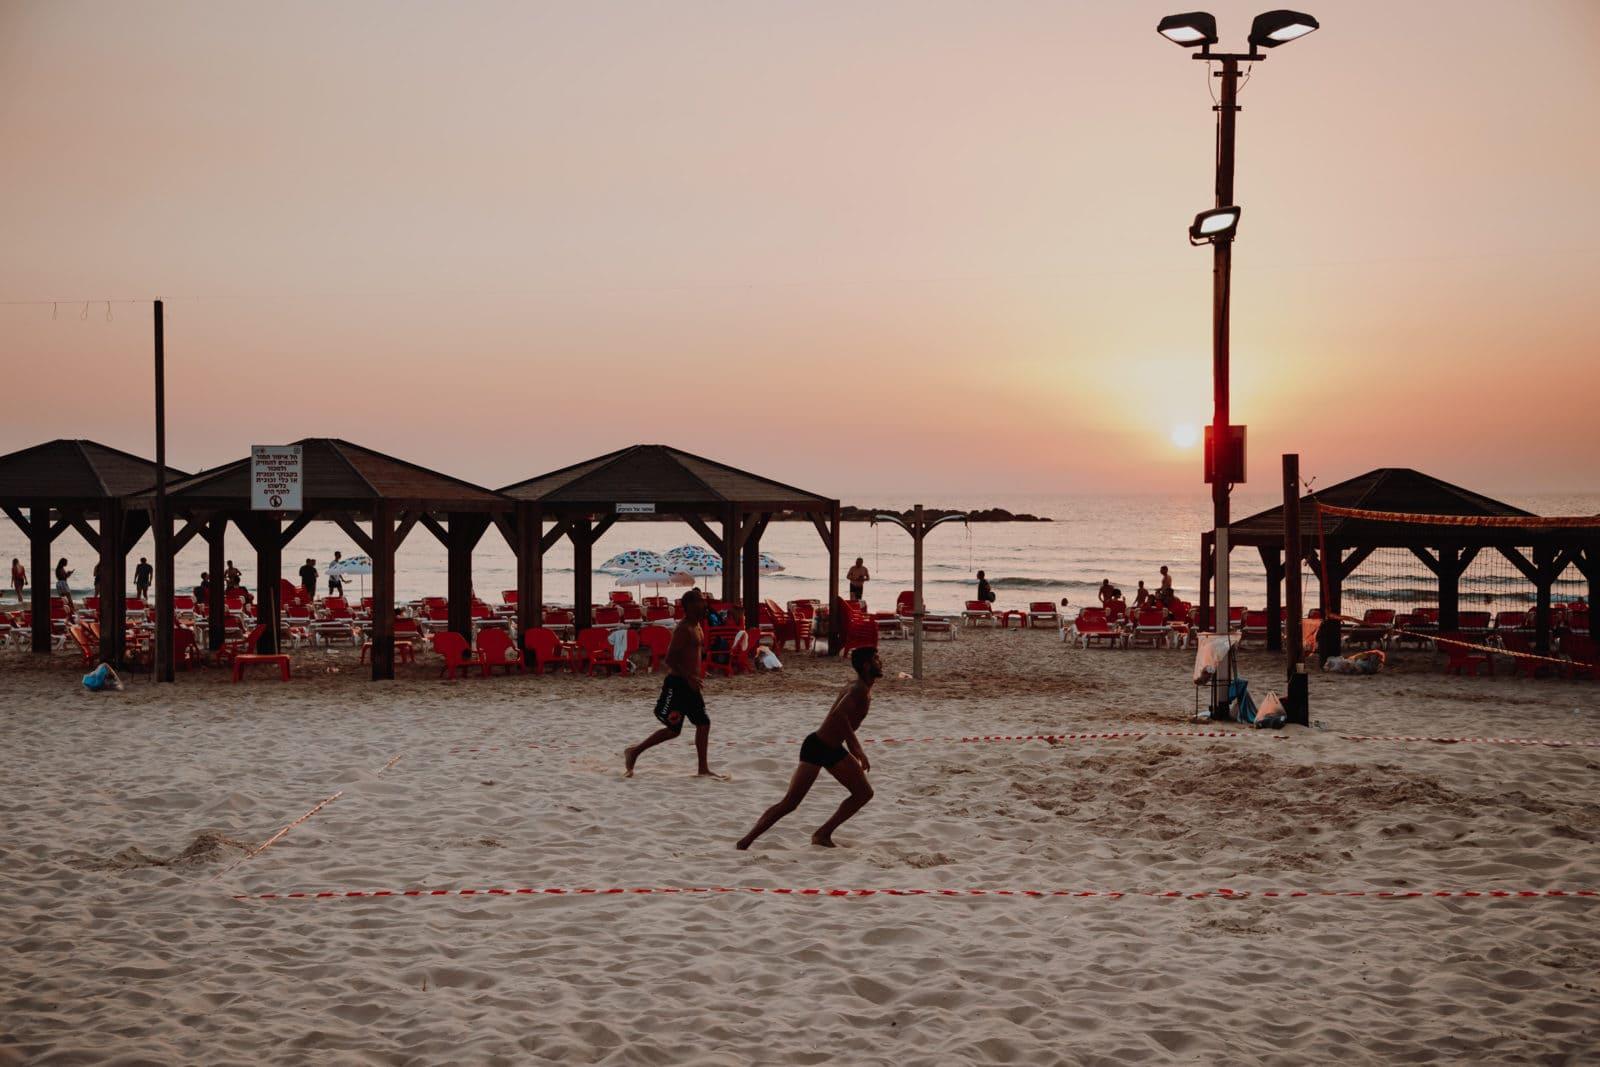 Tel Aviv Strand Frishman Beach Volleyball bei Sonnenuntergang